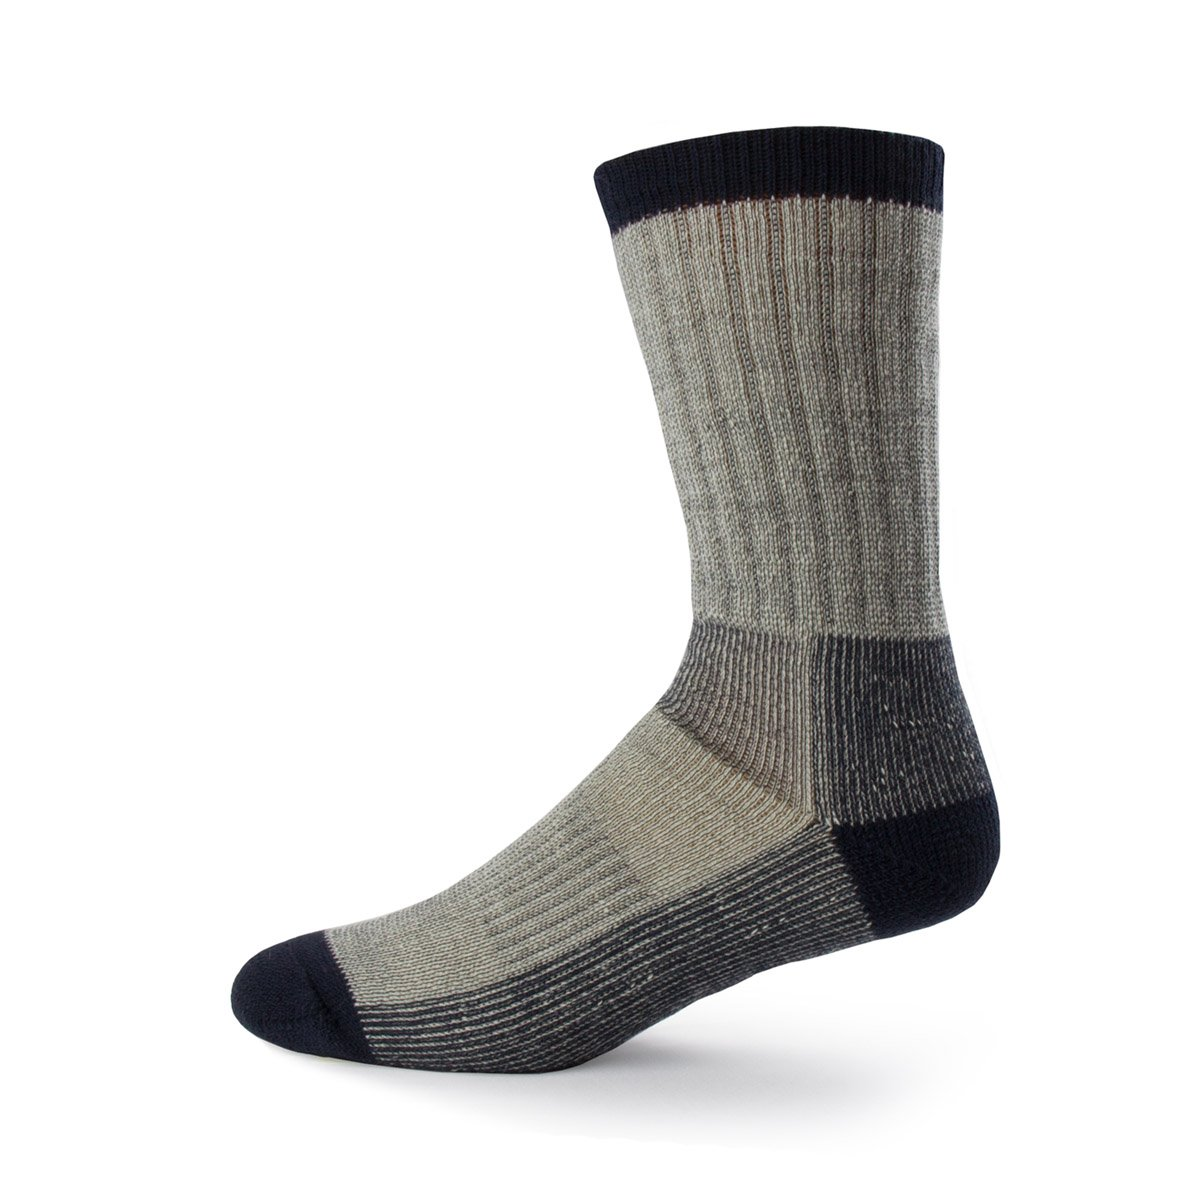 Minus33 Merino Wool Day Hiker Sock, Denim Heather, Large by Minus33 Merino Wool